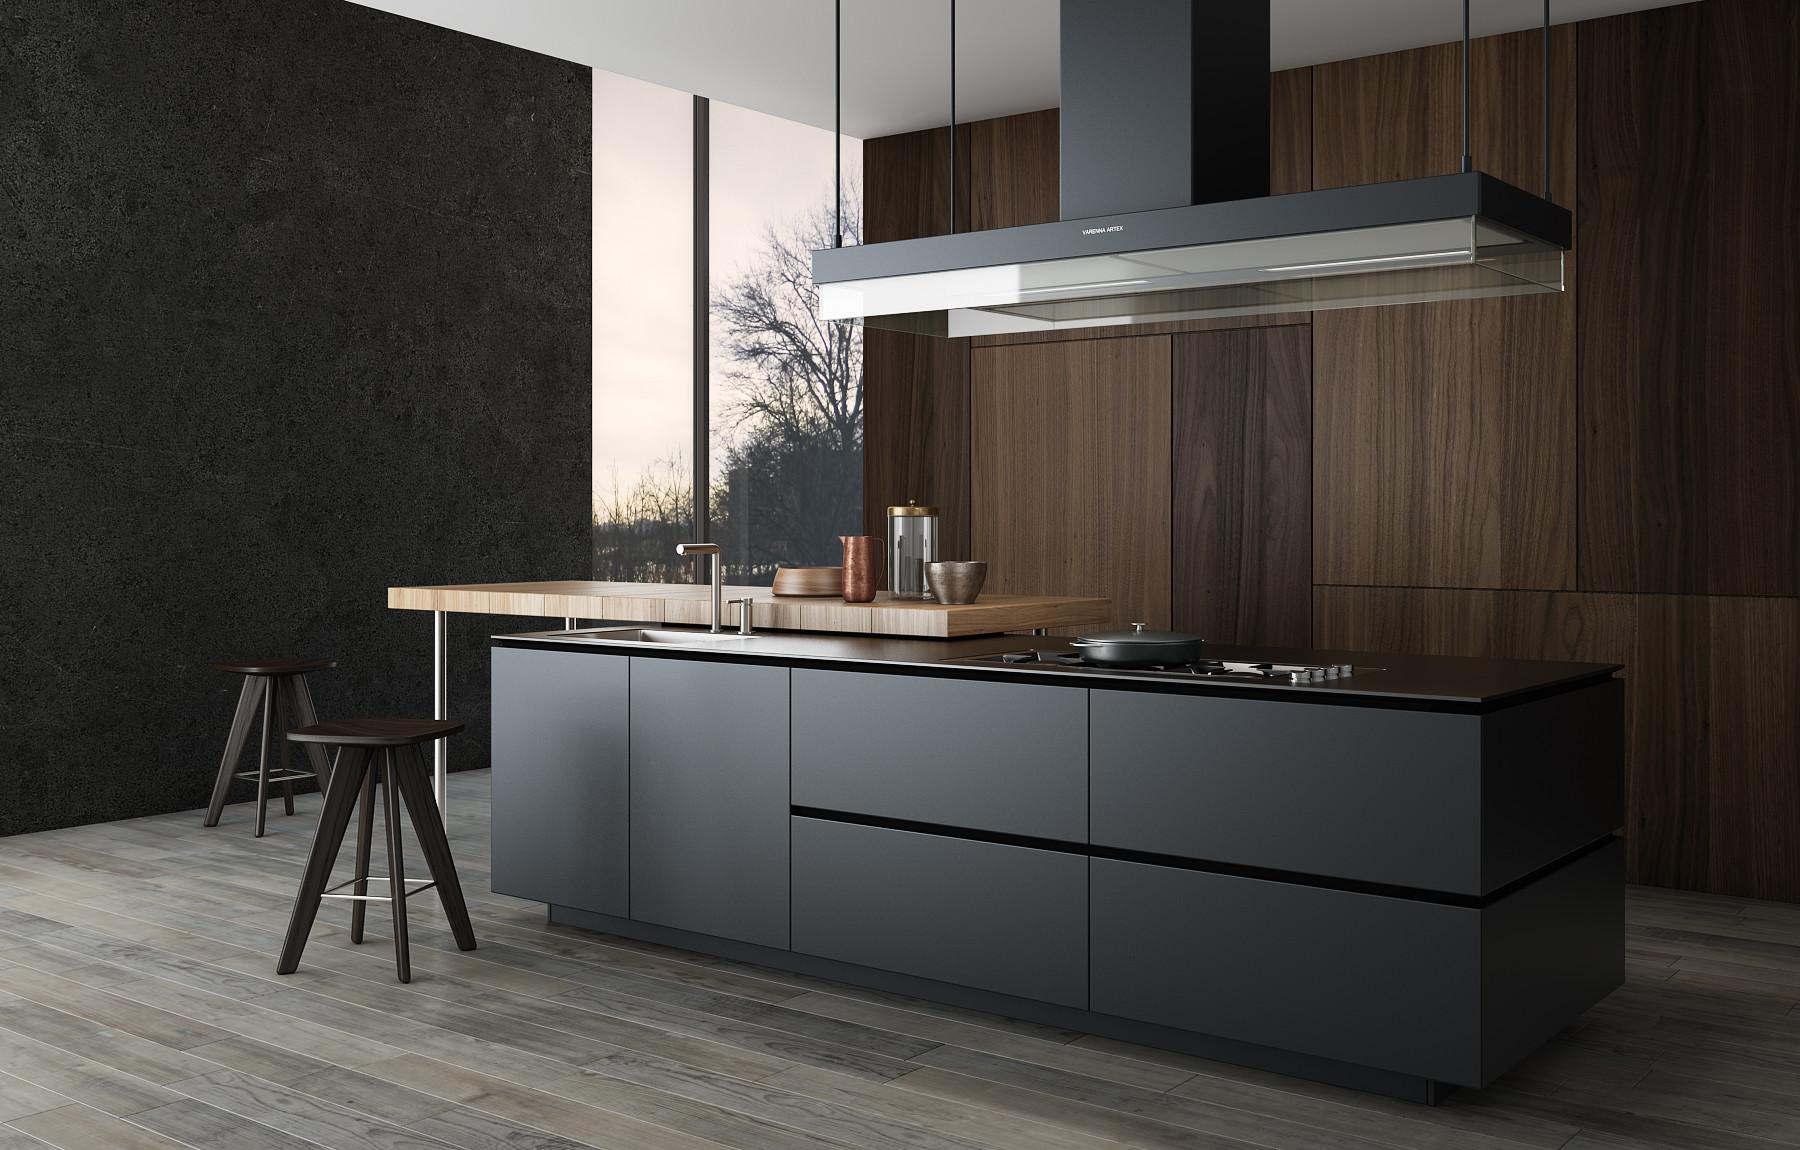 3dad_int_poli kitchen_01.jpg